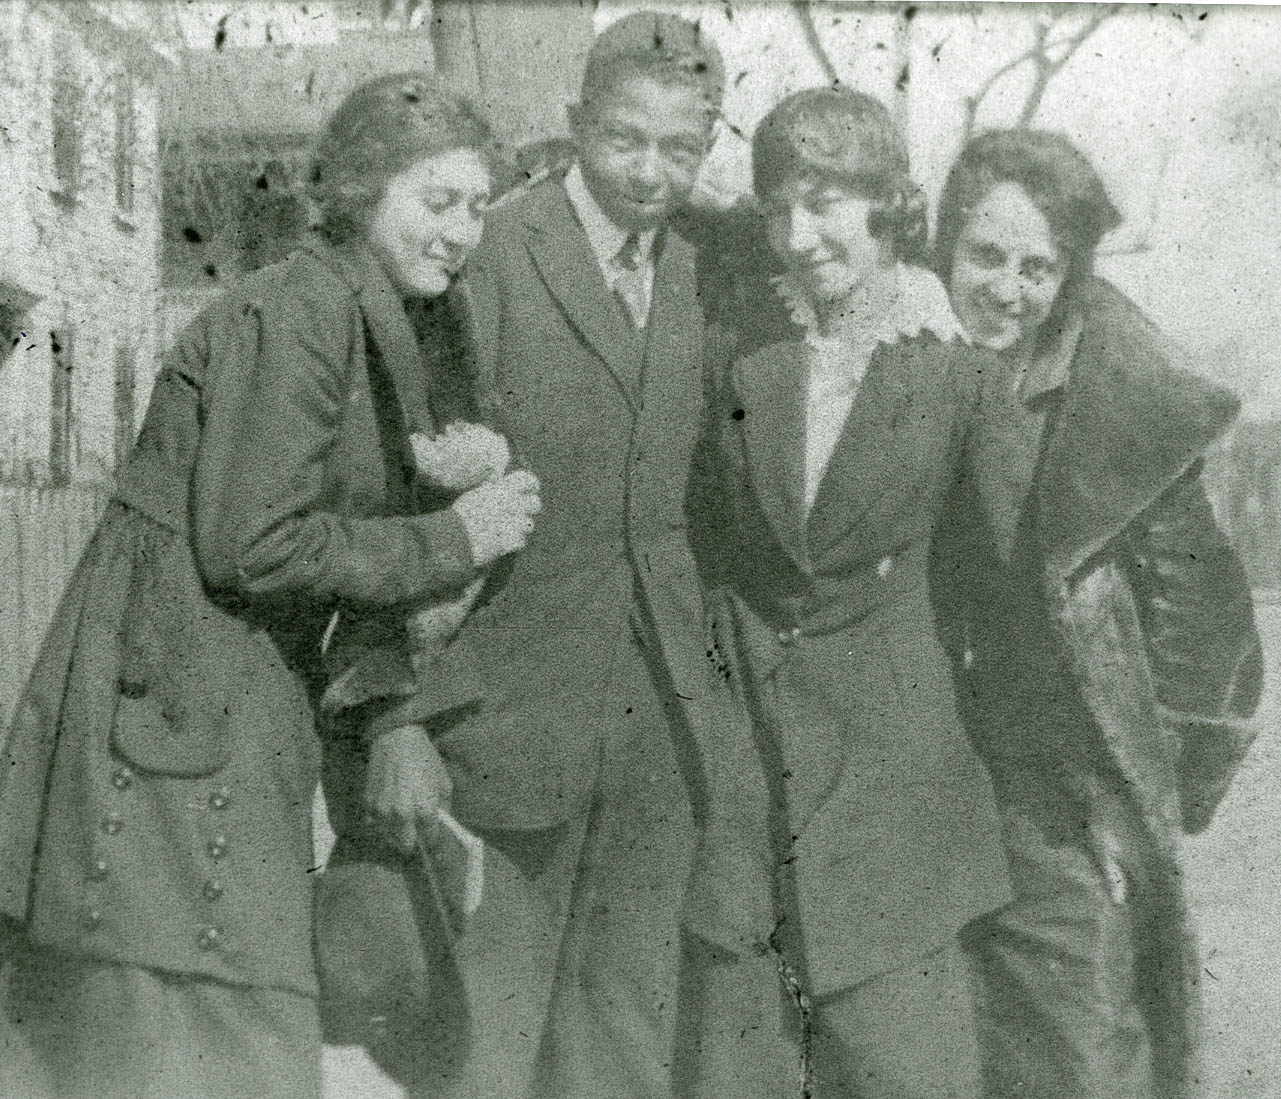 Four Averyites Posing